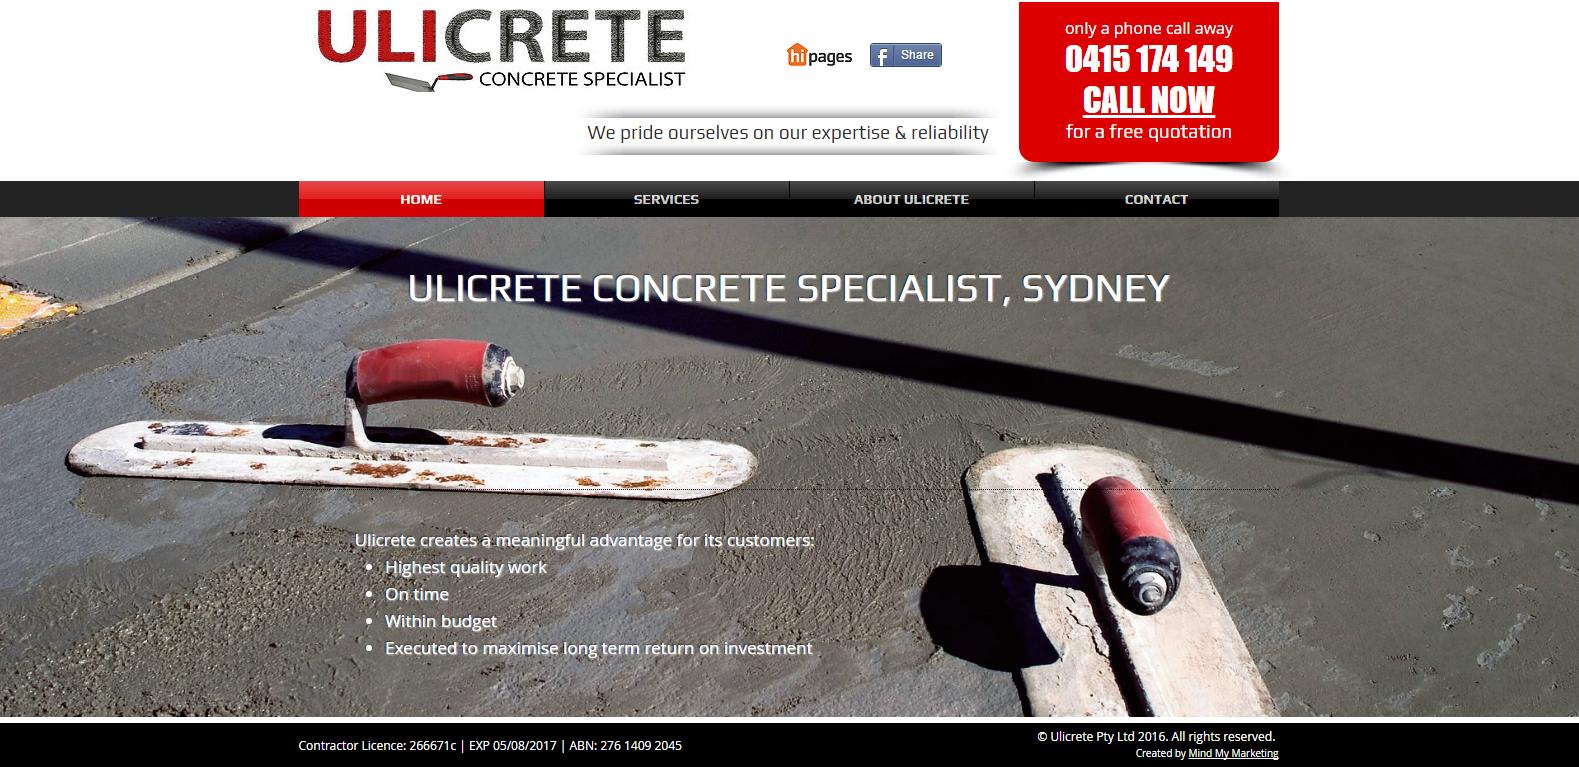 Ulicrete Concrete Specialist Sydney